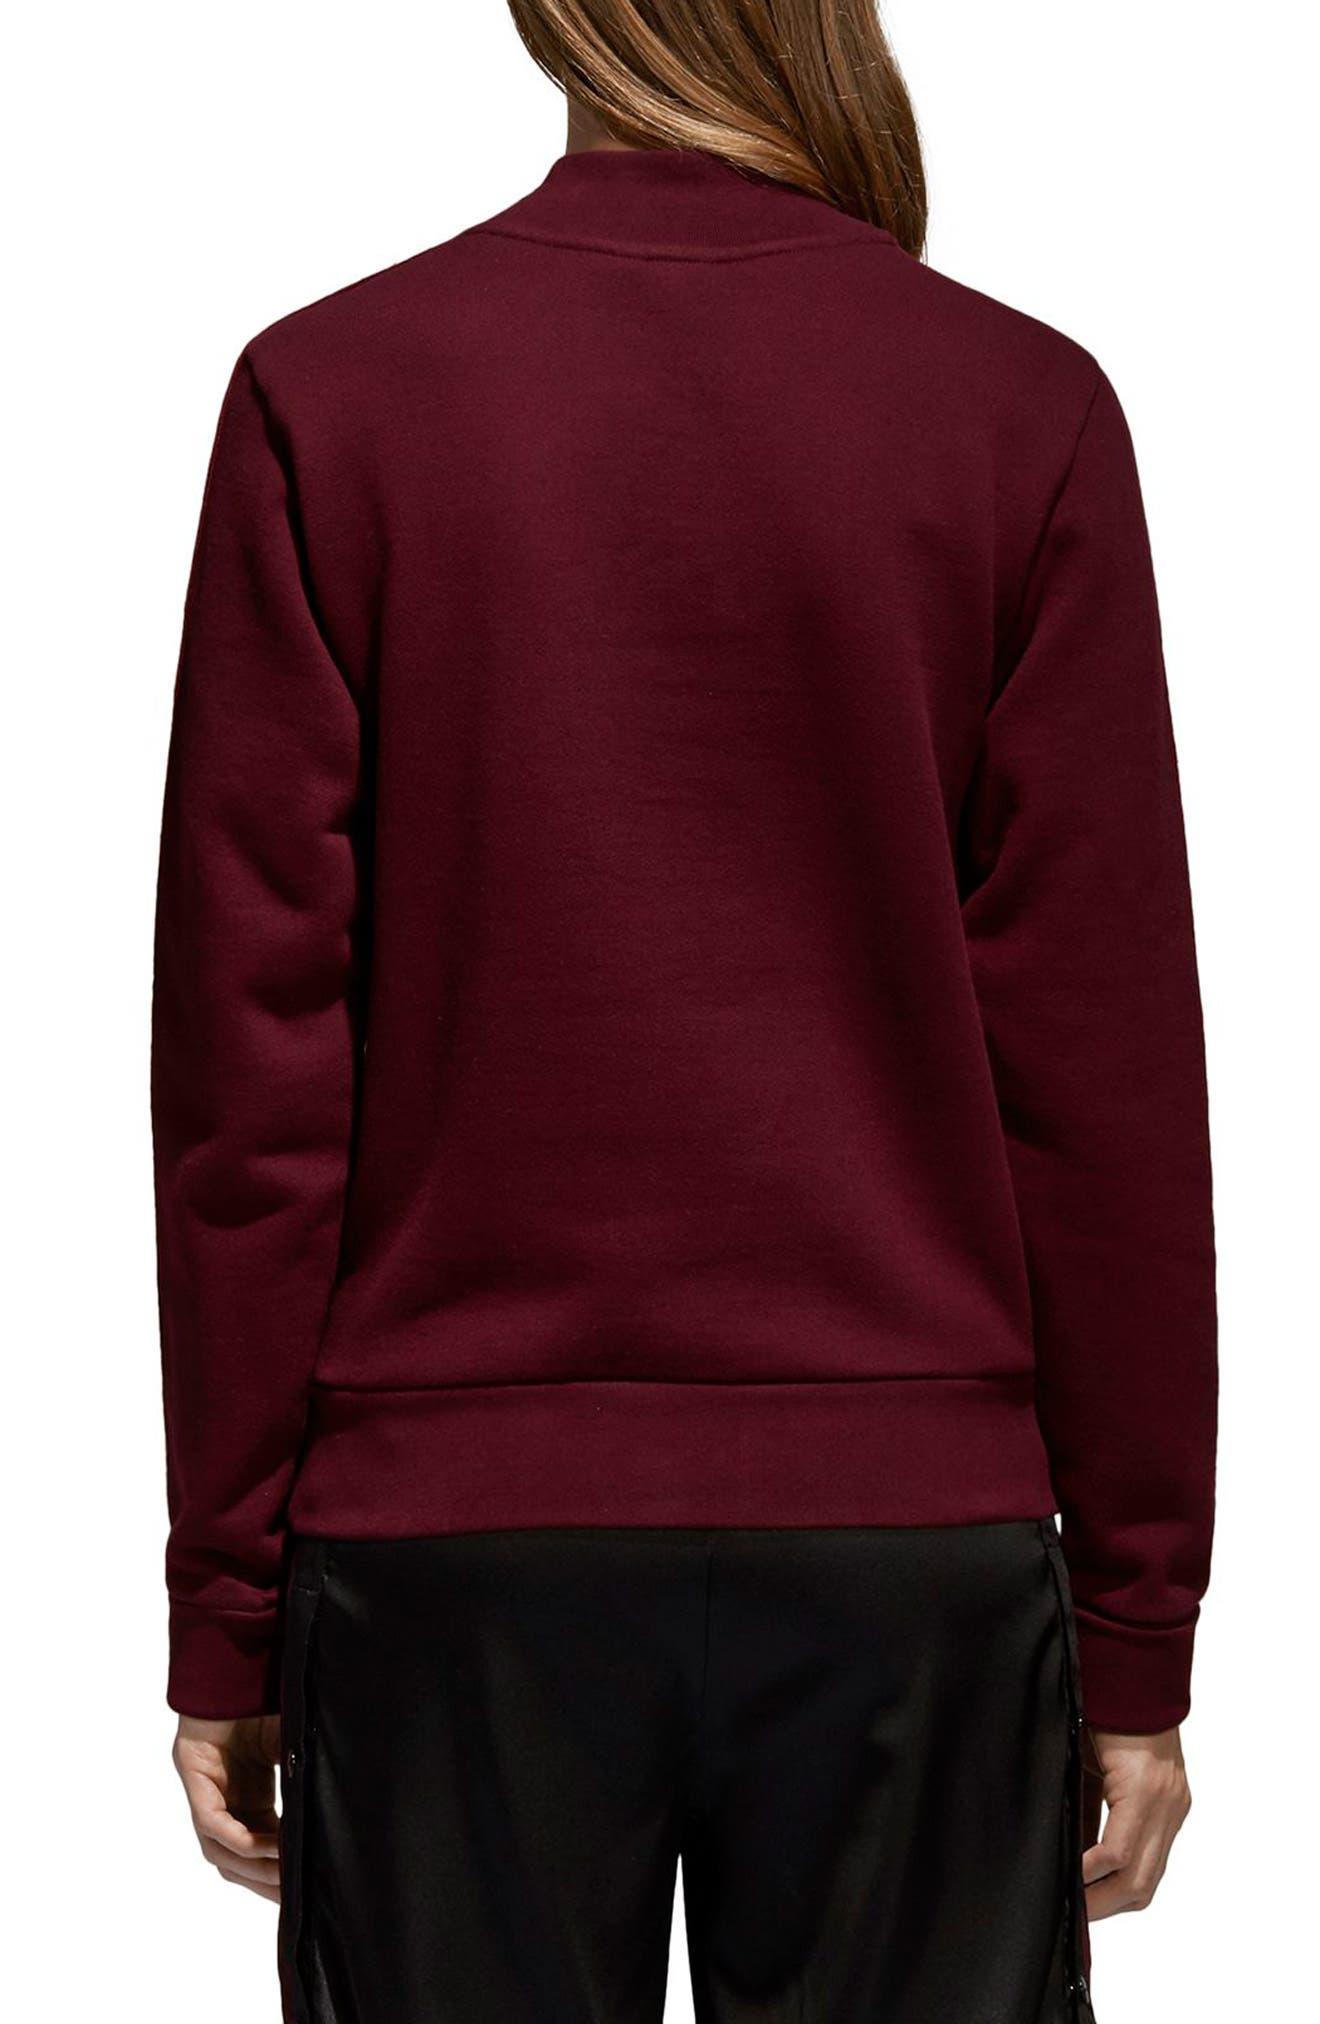 Originals Adibreak Sweatshirt,                             Alternate thumbnail 2, color,                             Maroon